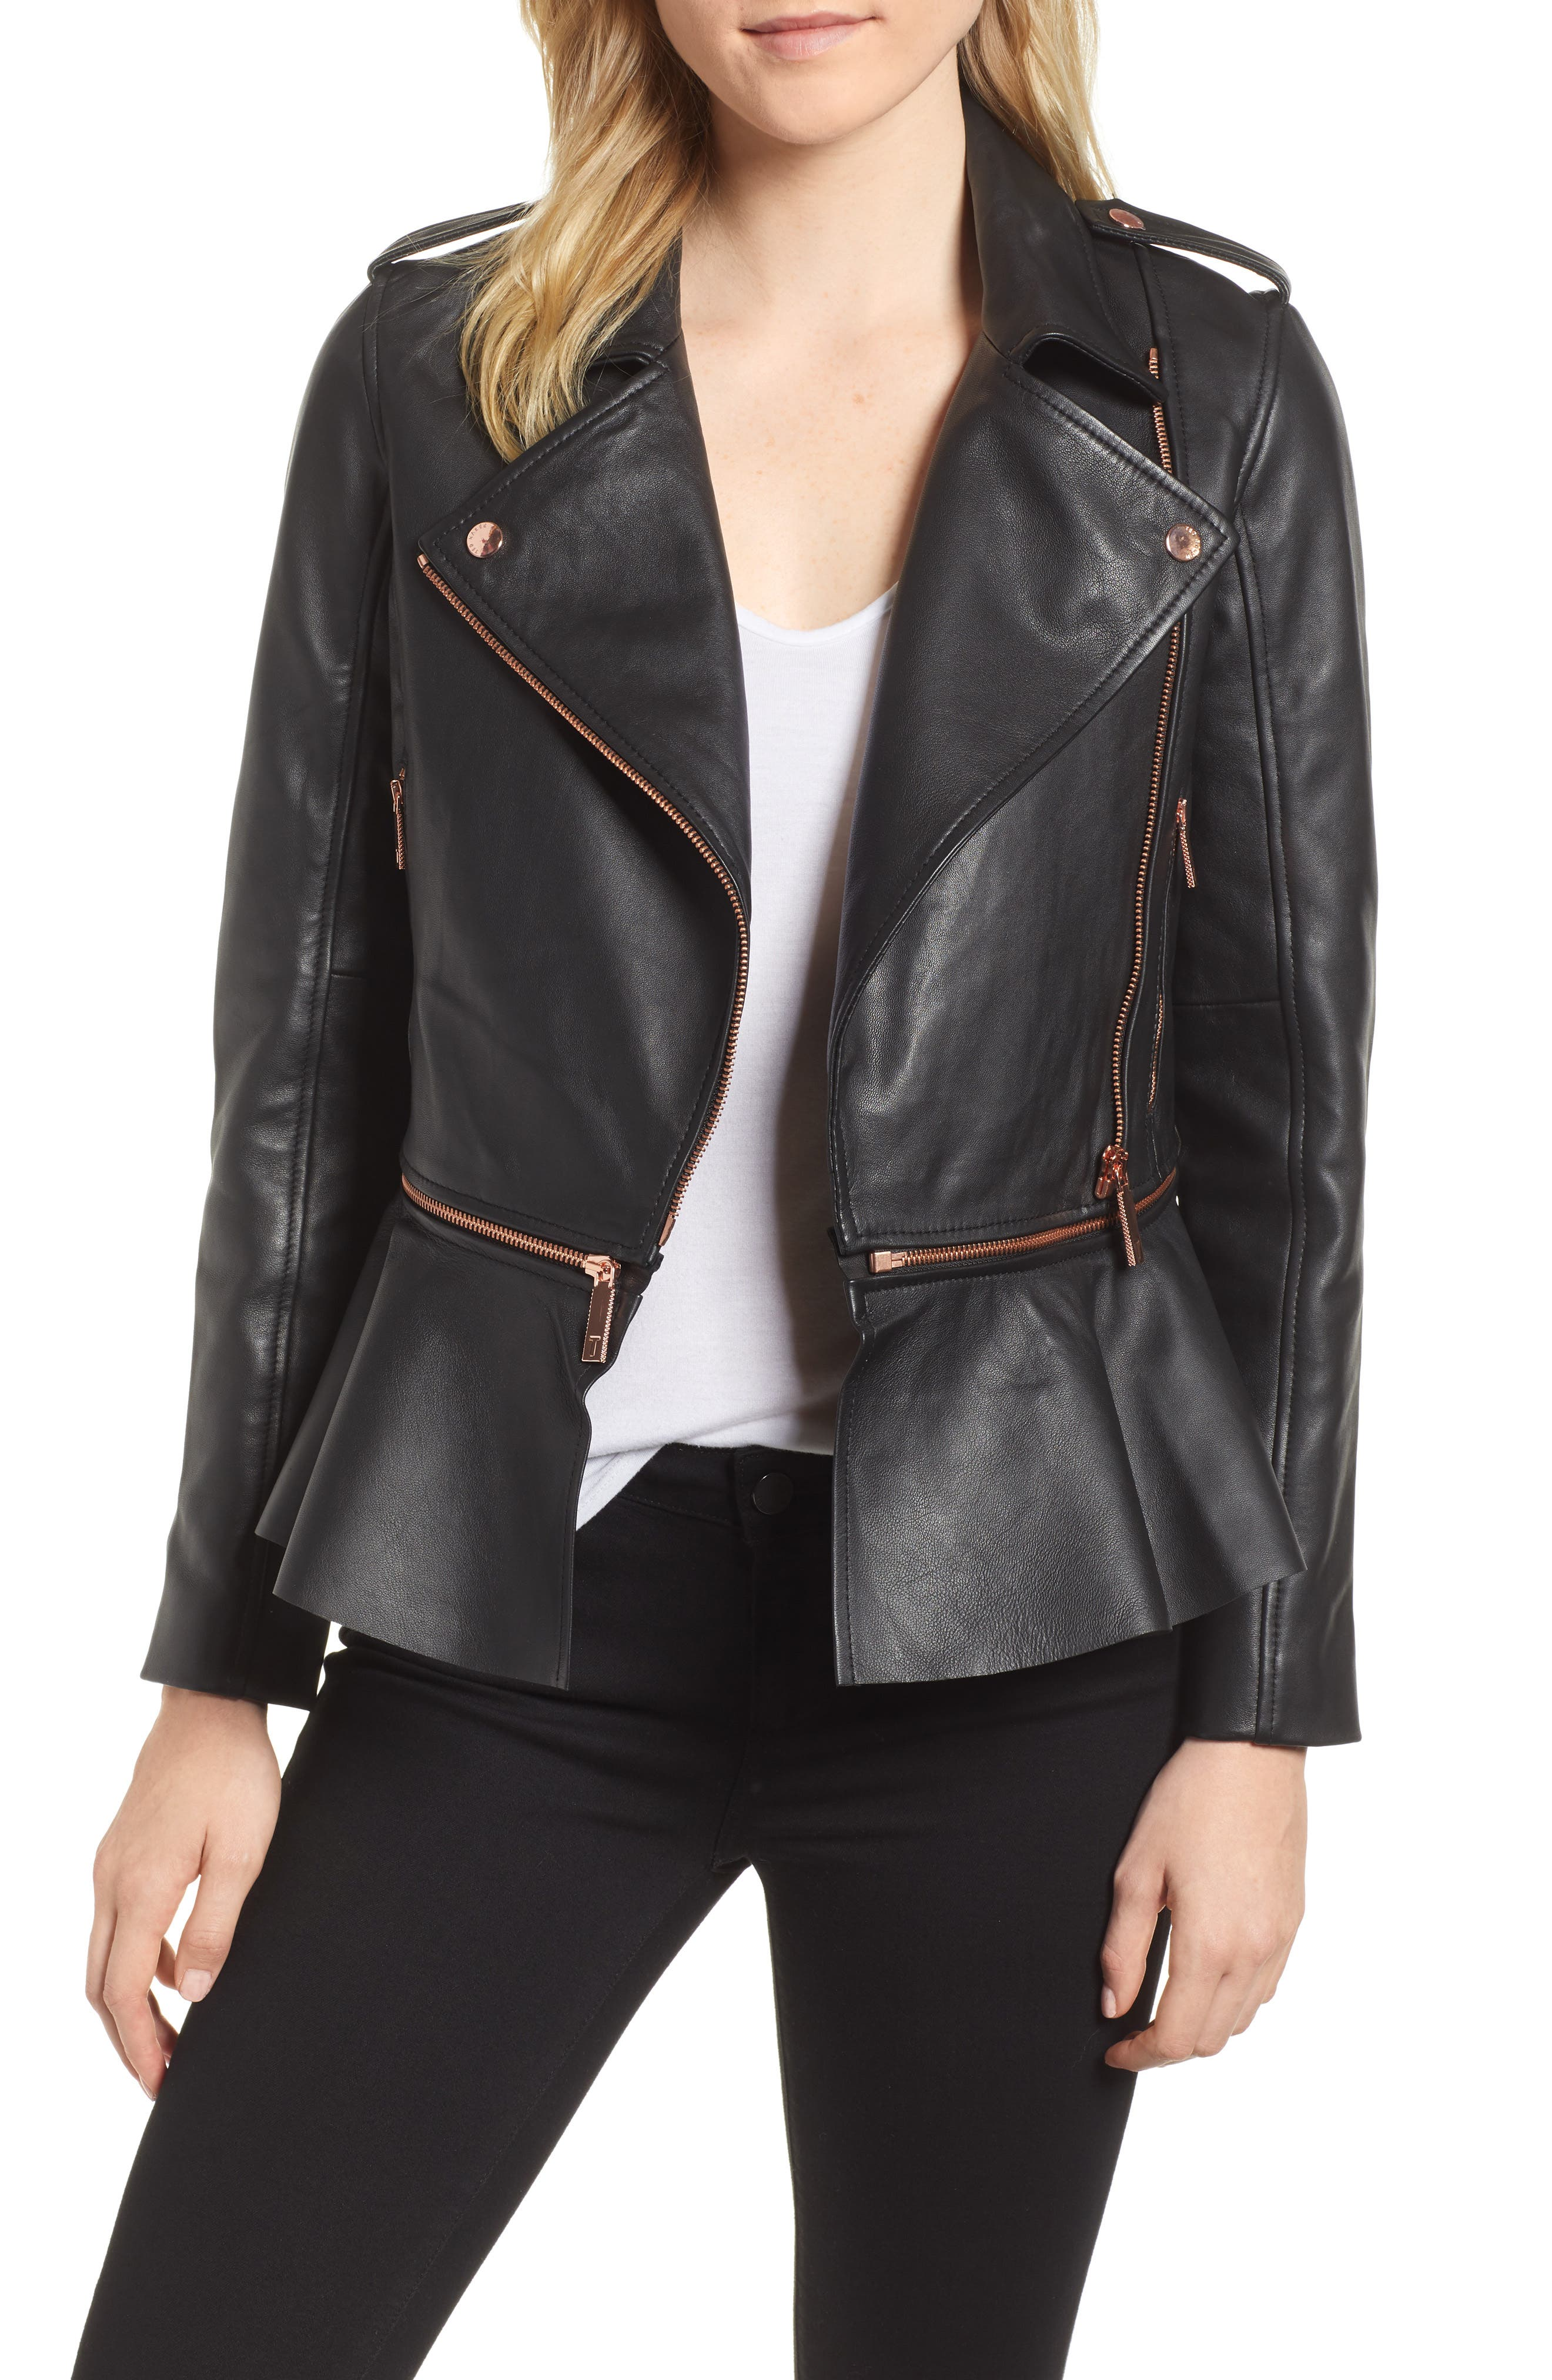 Alternate Image 1 Selected - Ted Baker London Zip-Off Peplum Leather Biker Jacket